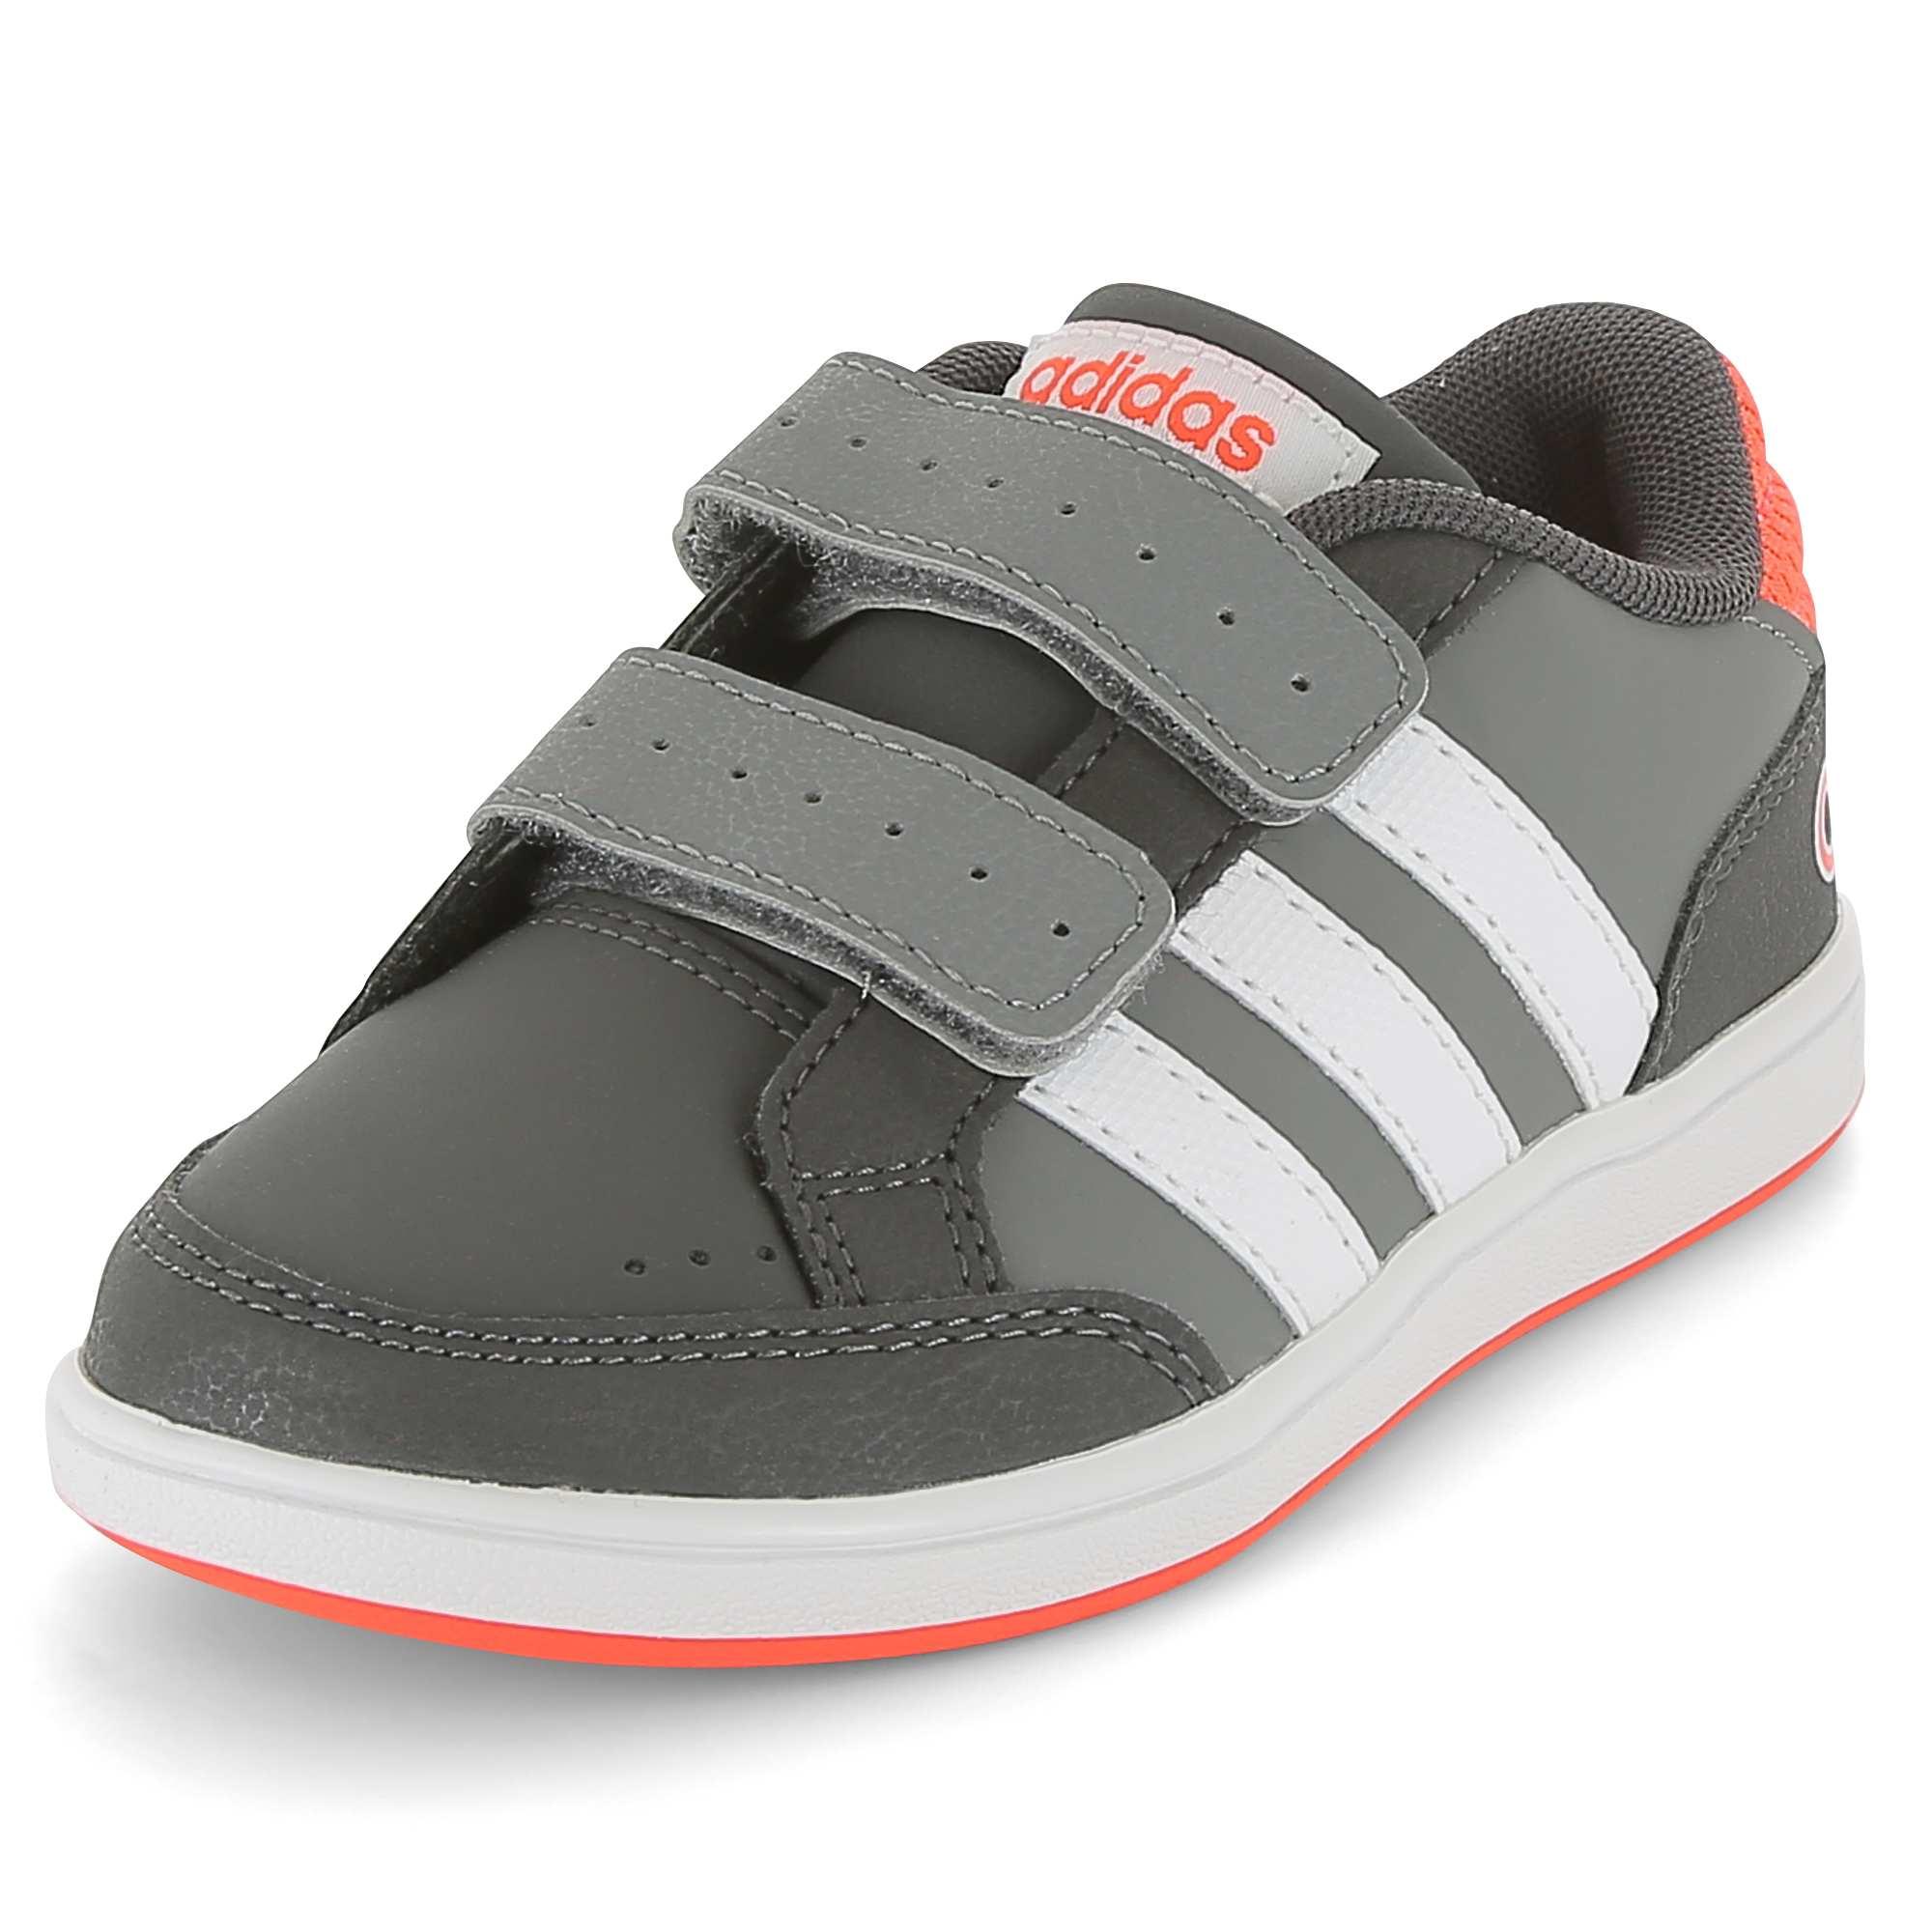 Chaussures Adidas grises garçon HX7QI